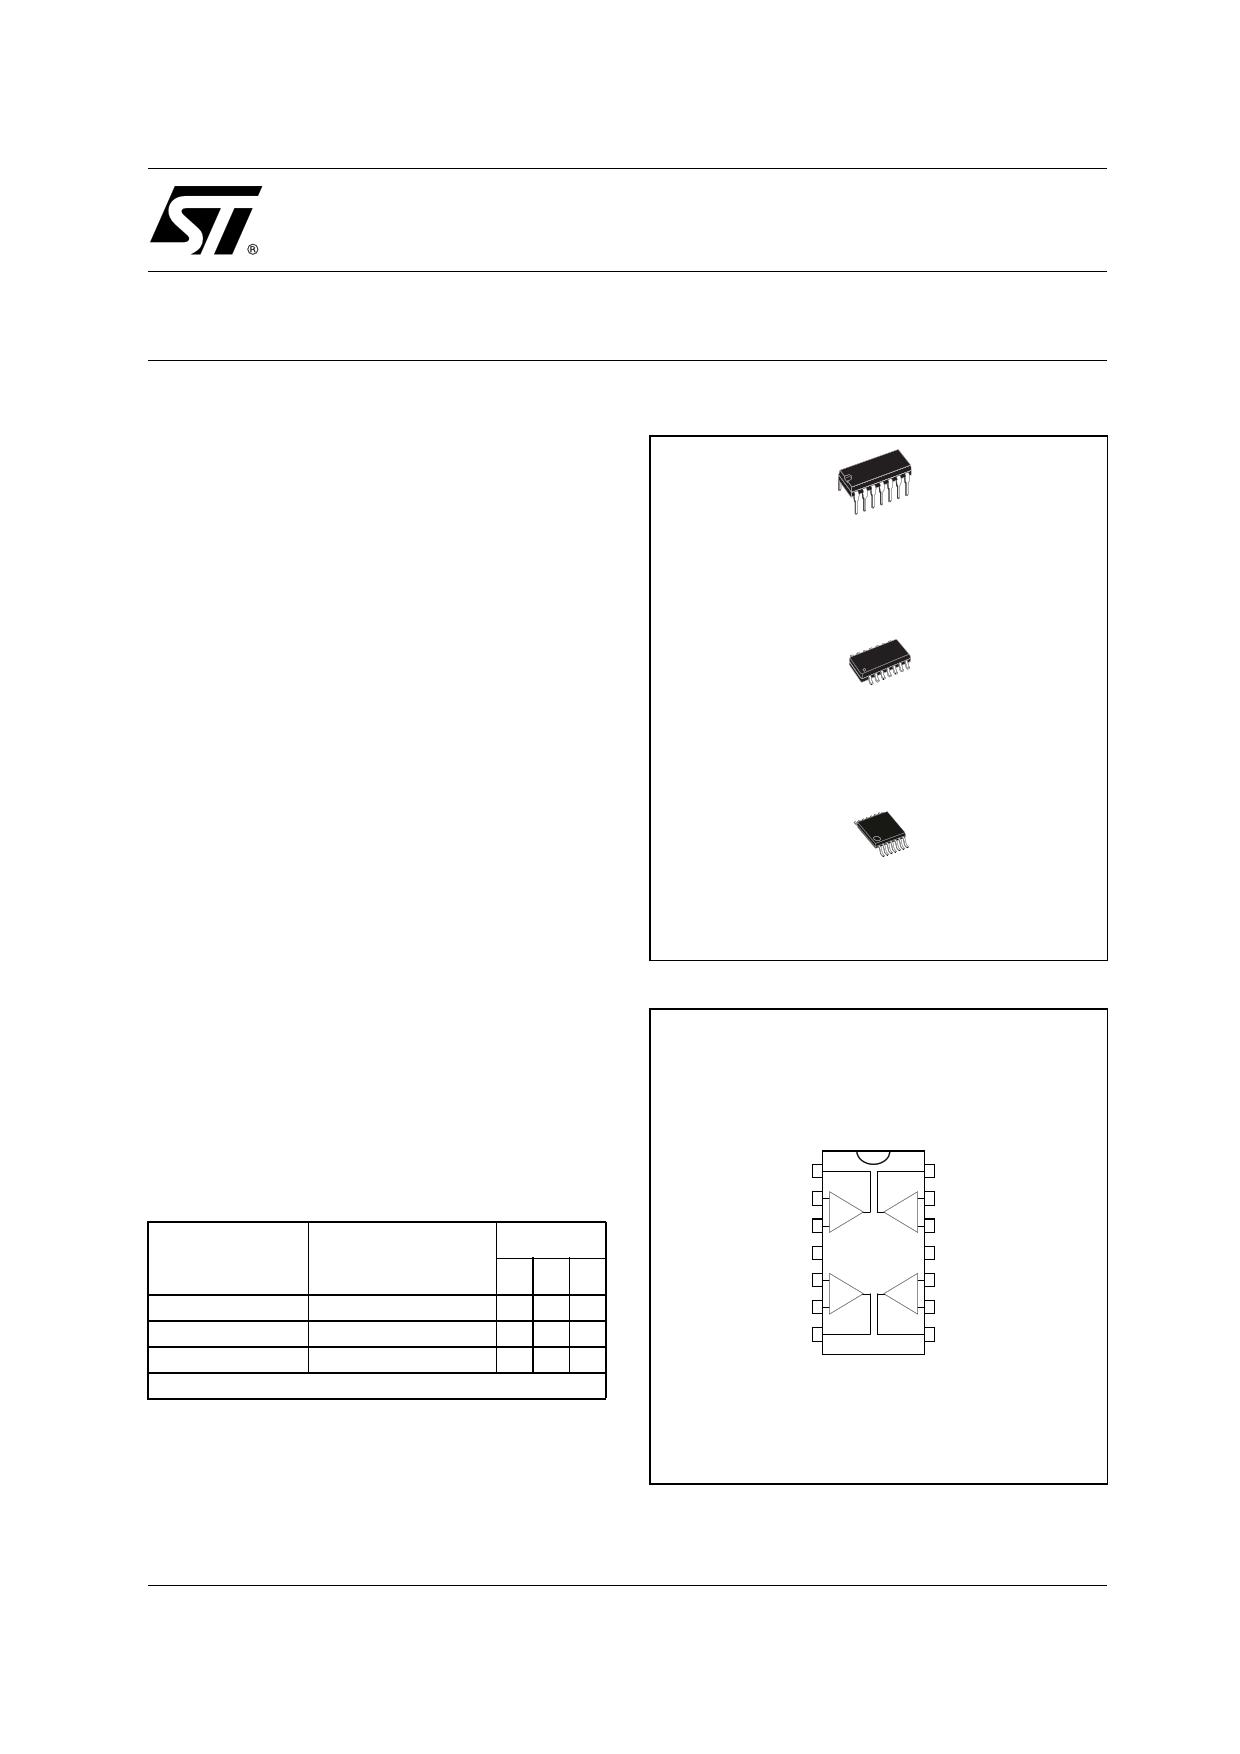 TS27L4BC Datasheet, TS27L4BC PDF,ピン配置, 機能